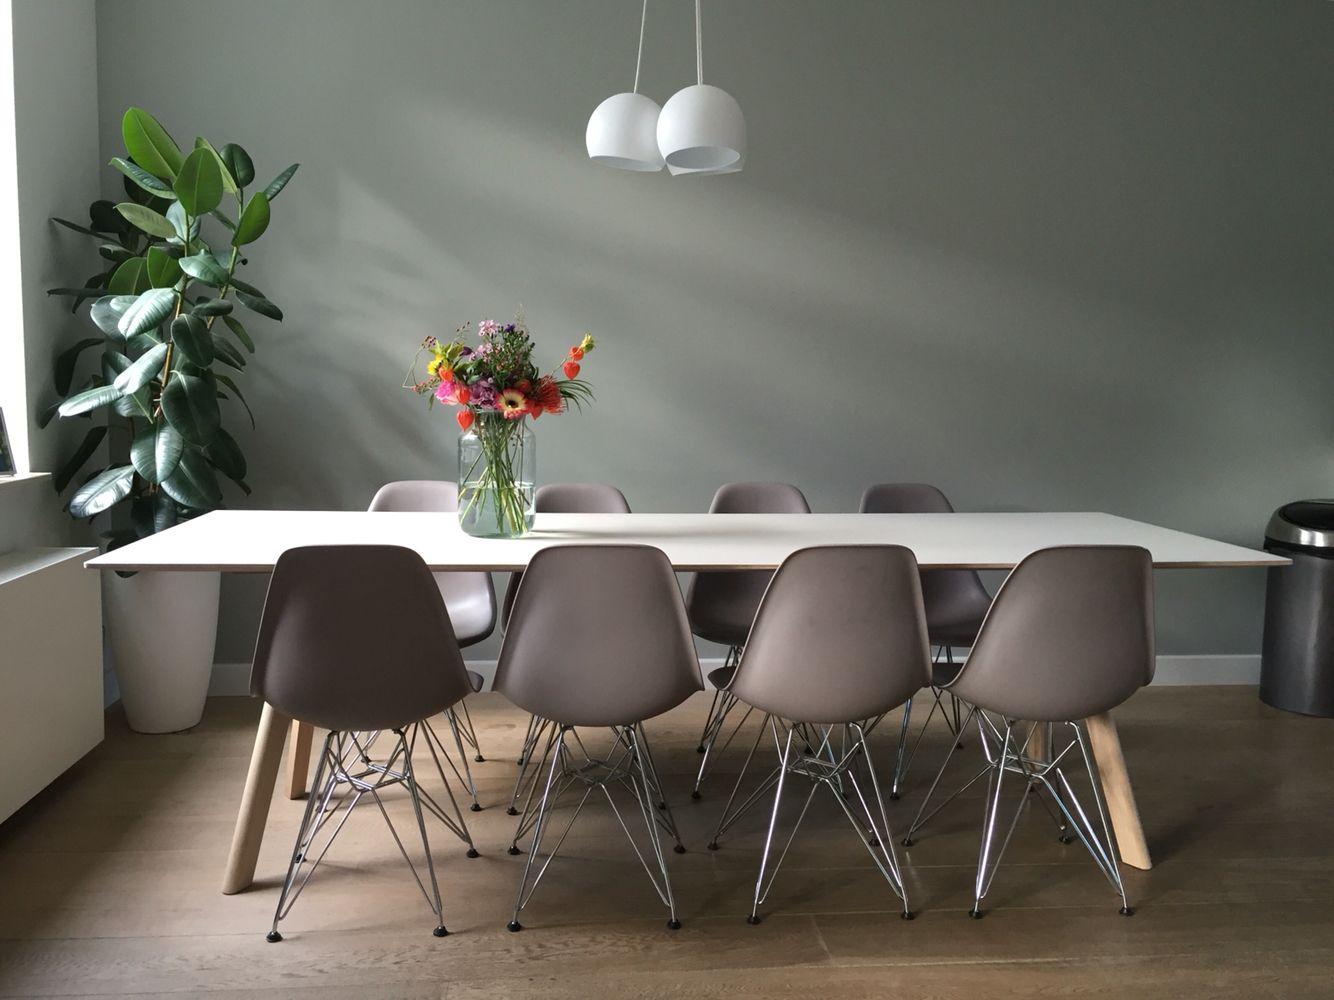 Vitra Stoel Wit : Eettafel hay met vitra dsr stoelen taupe en mat witte lamp